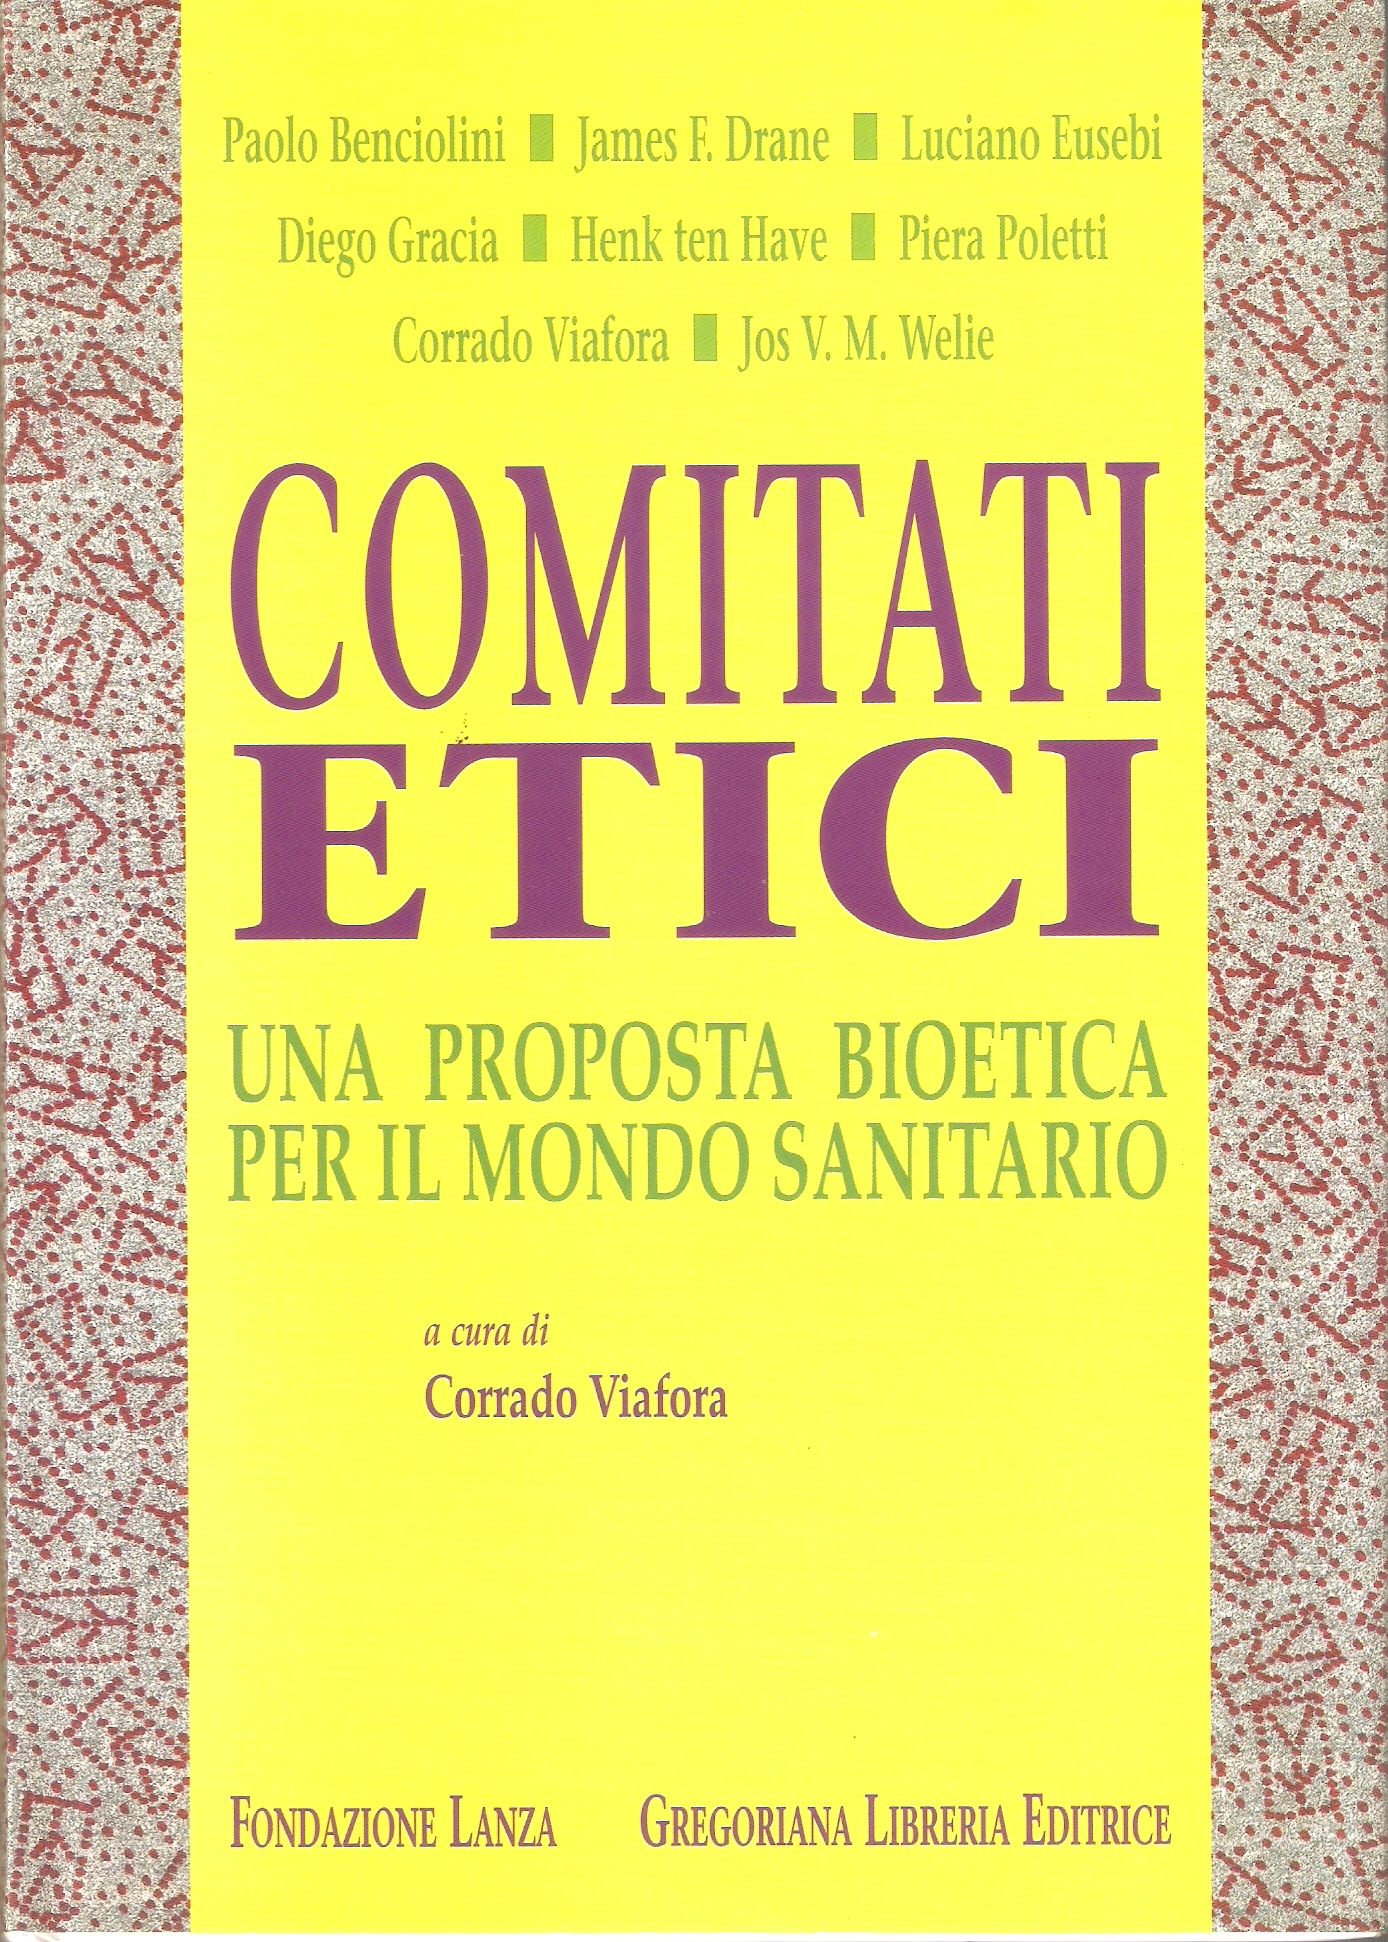 Comitati etici